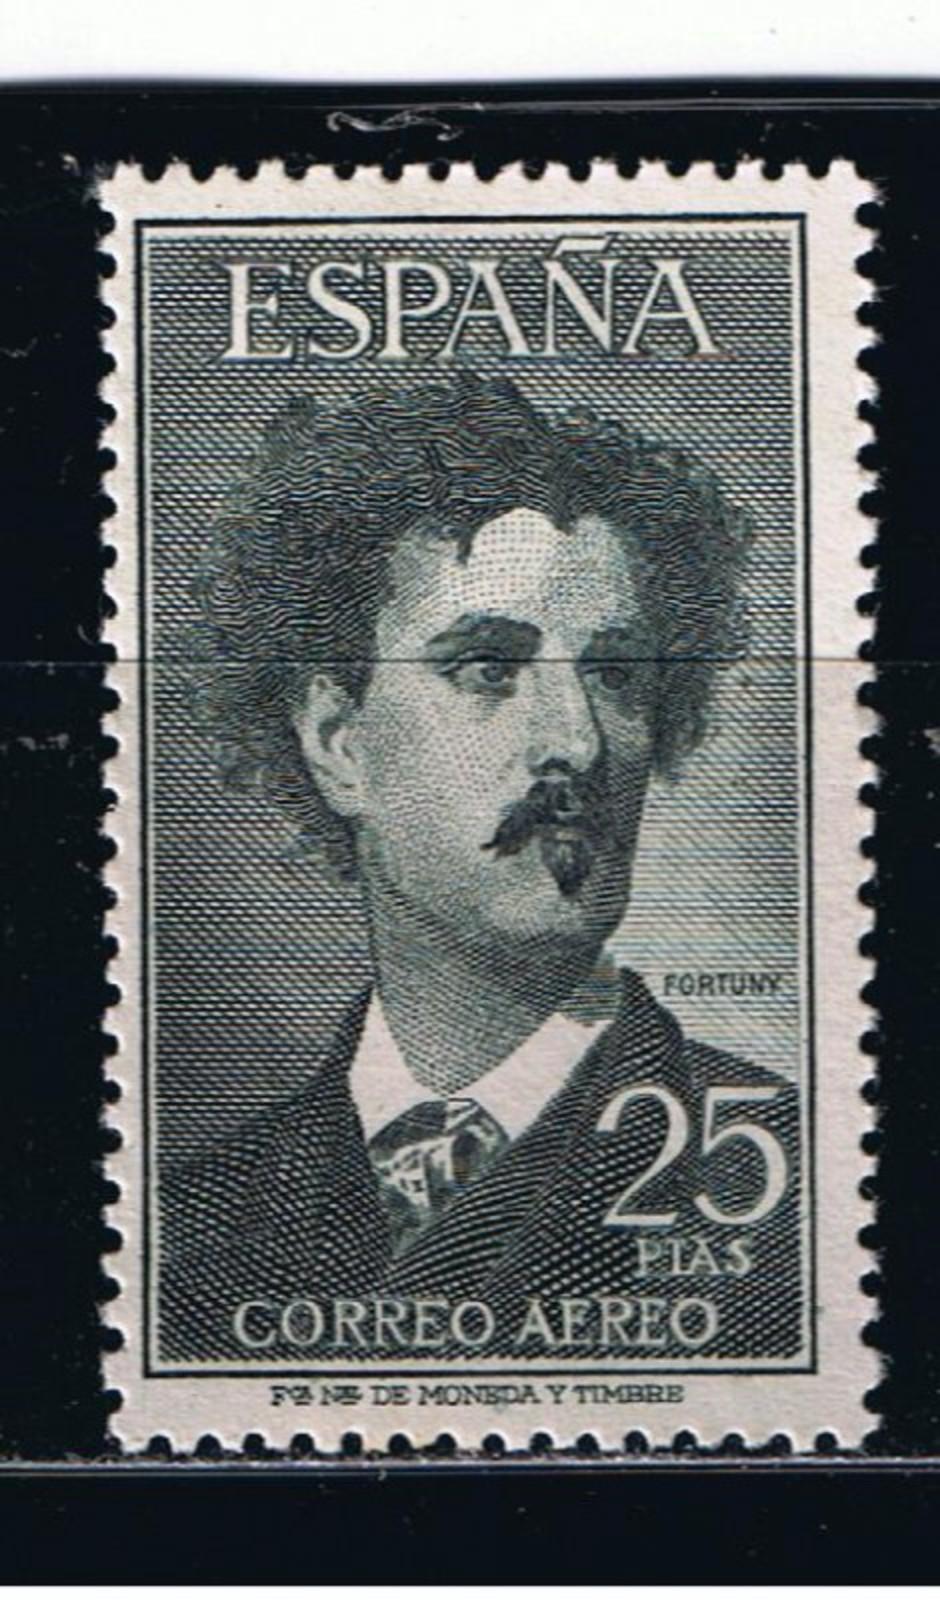 Moneda de 200 Pesetas - 1996 Fortuni